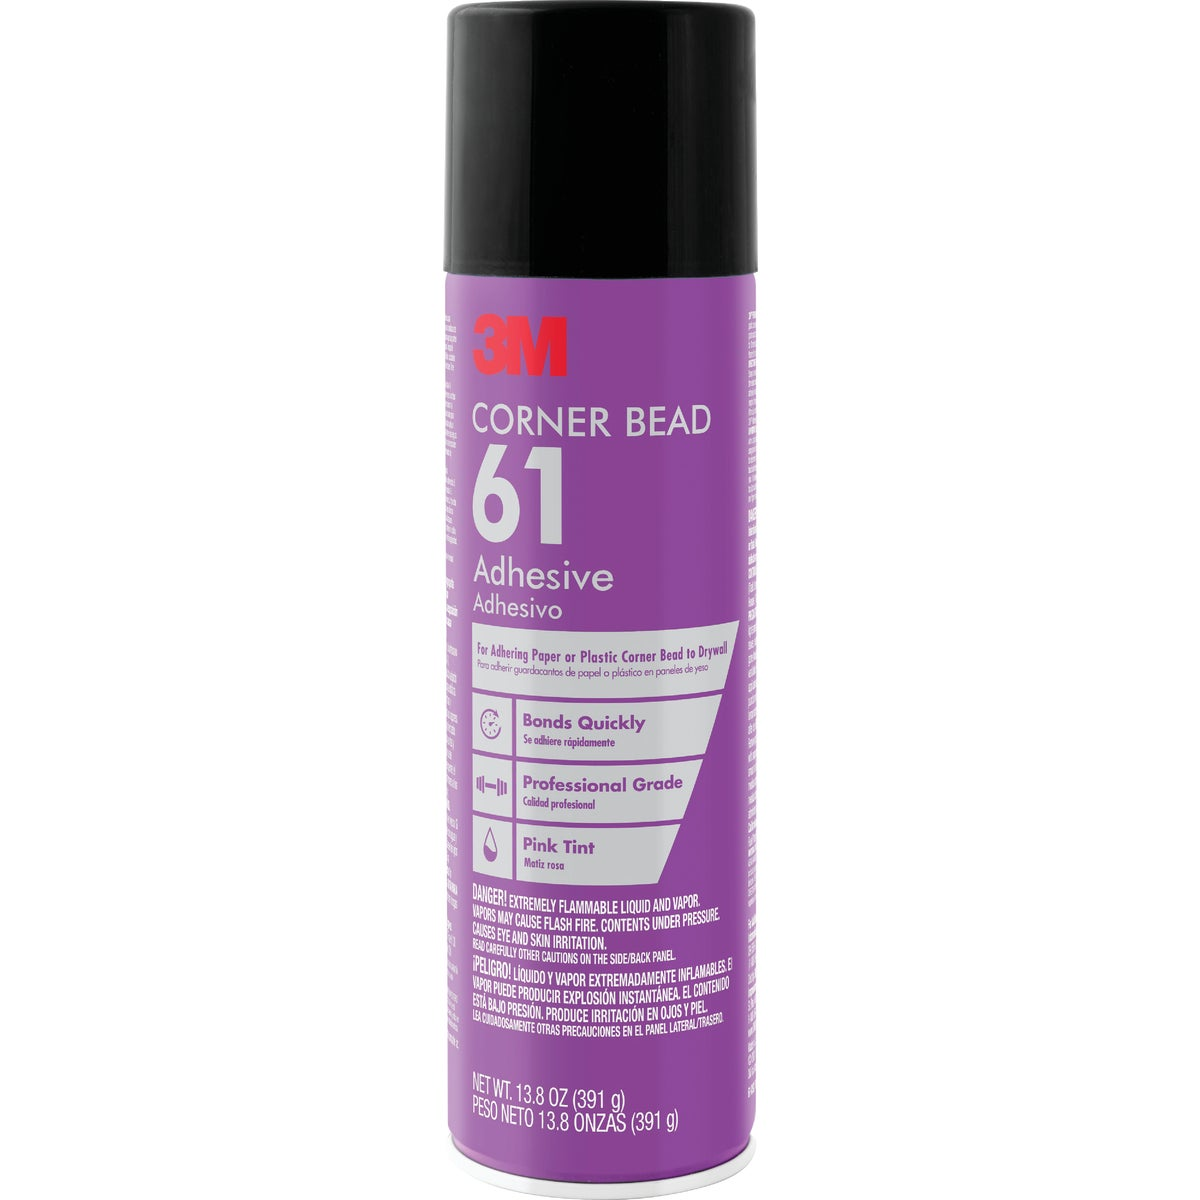 3M Drywall Corner Bead Spray Adhesive